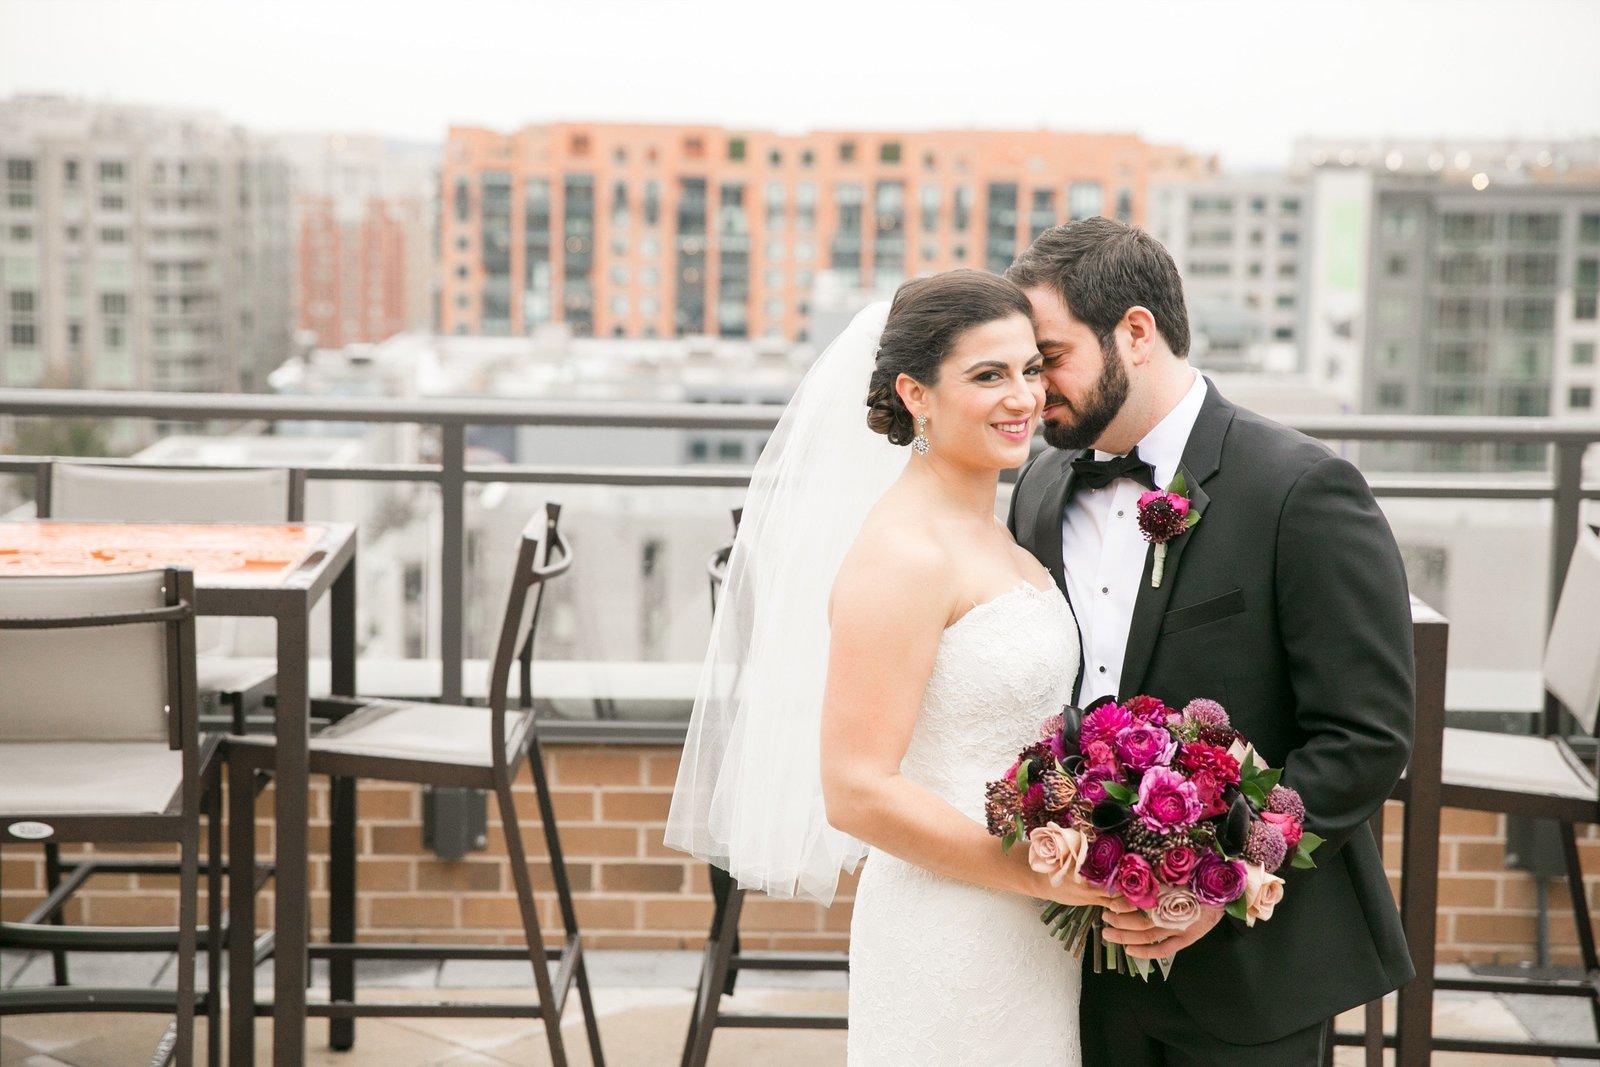 Black-tie-wedding-photos-longview-gallery-dc (136)